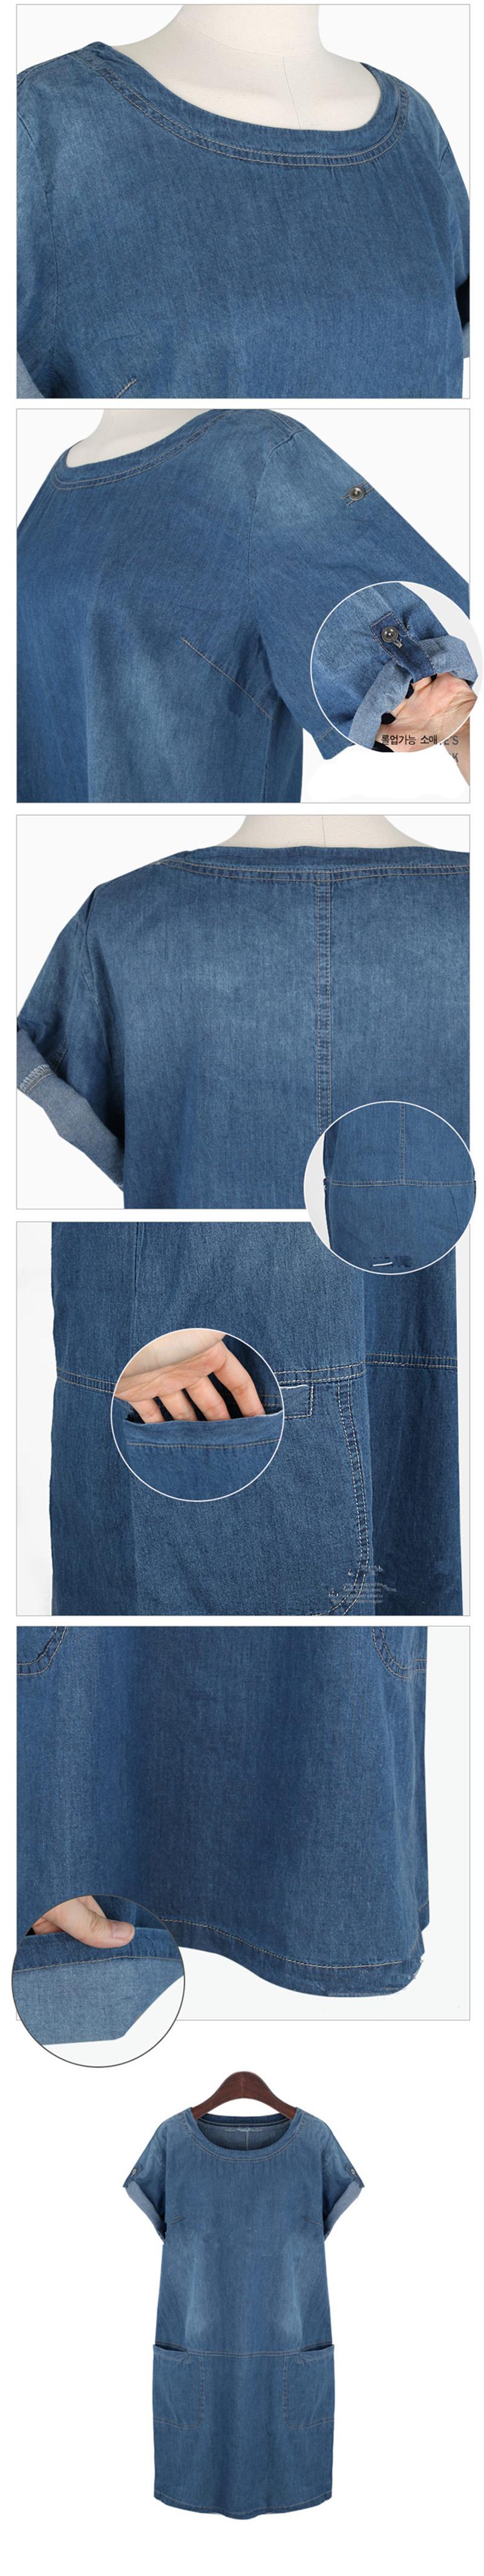 Denim Dress 2017 Summer Plus Size 4XL 5XL Ladies Short Sleeve Casual Stright Fashion Dresses vestidos mujer jeans feminino robe (5)